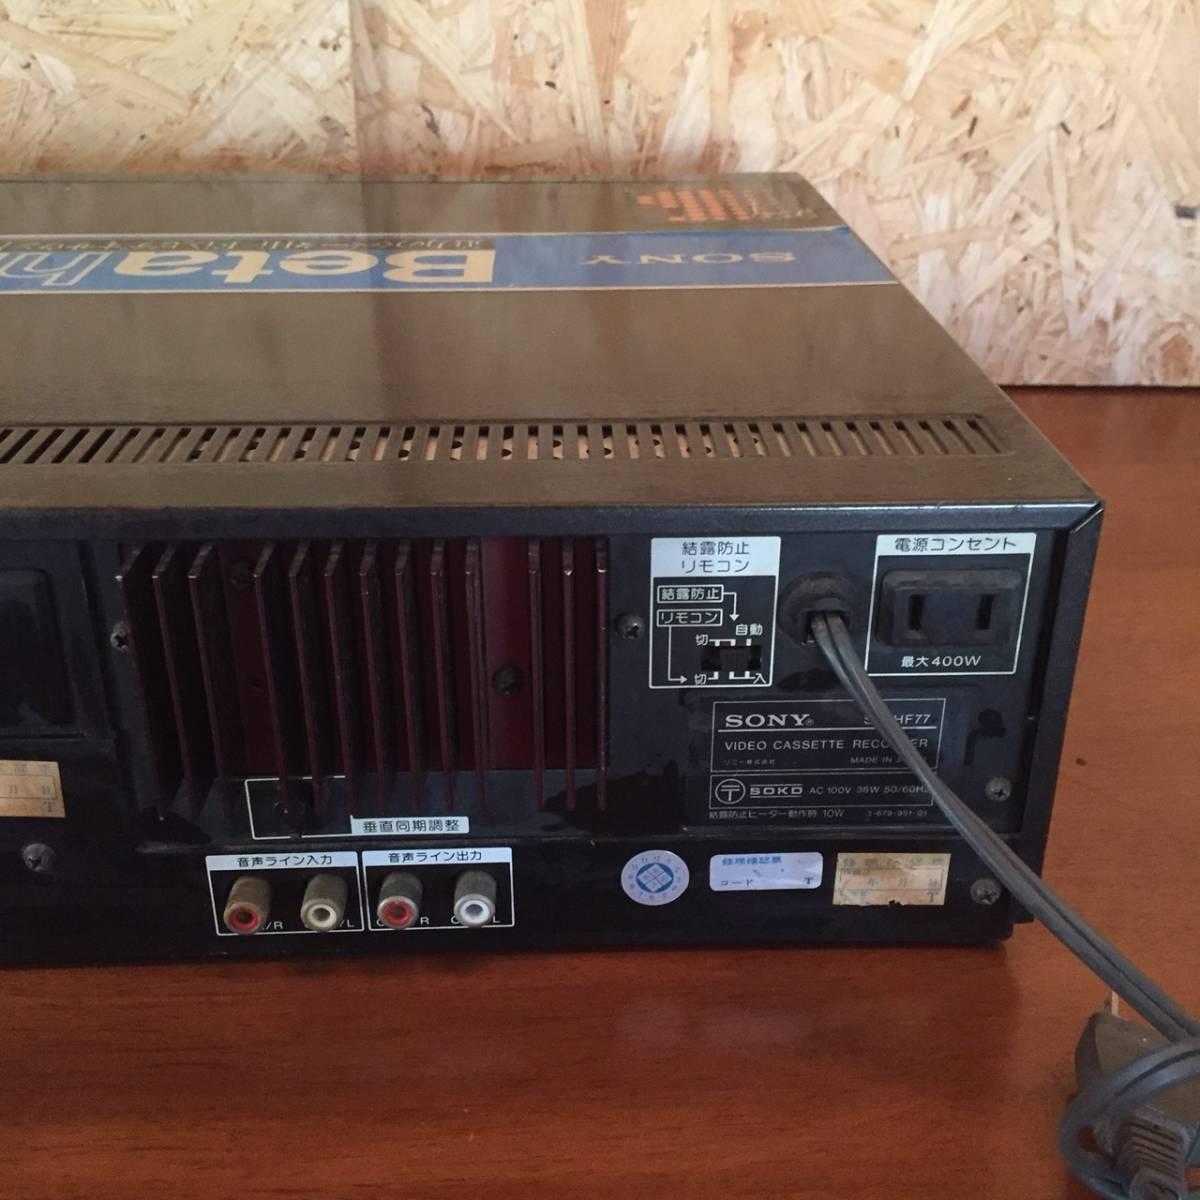 O1-567-0818 SONY Beta ベータビデオデッキ Hi-Fi SL-HF77 通電確認のみなので、ジャンク出品_画像8